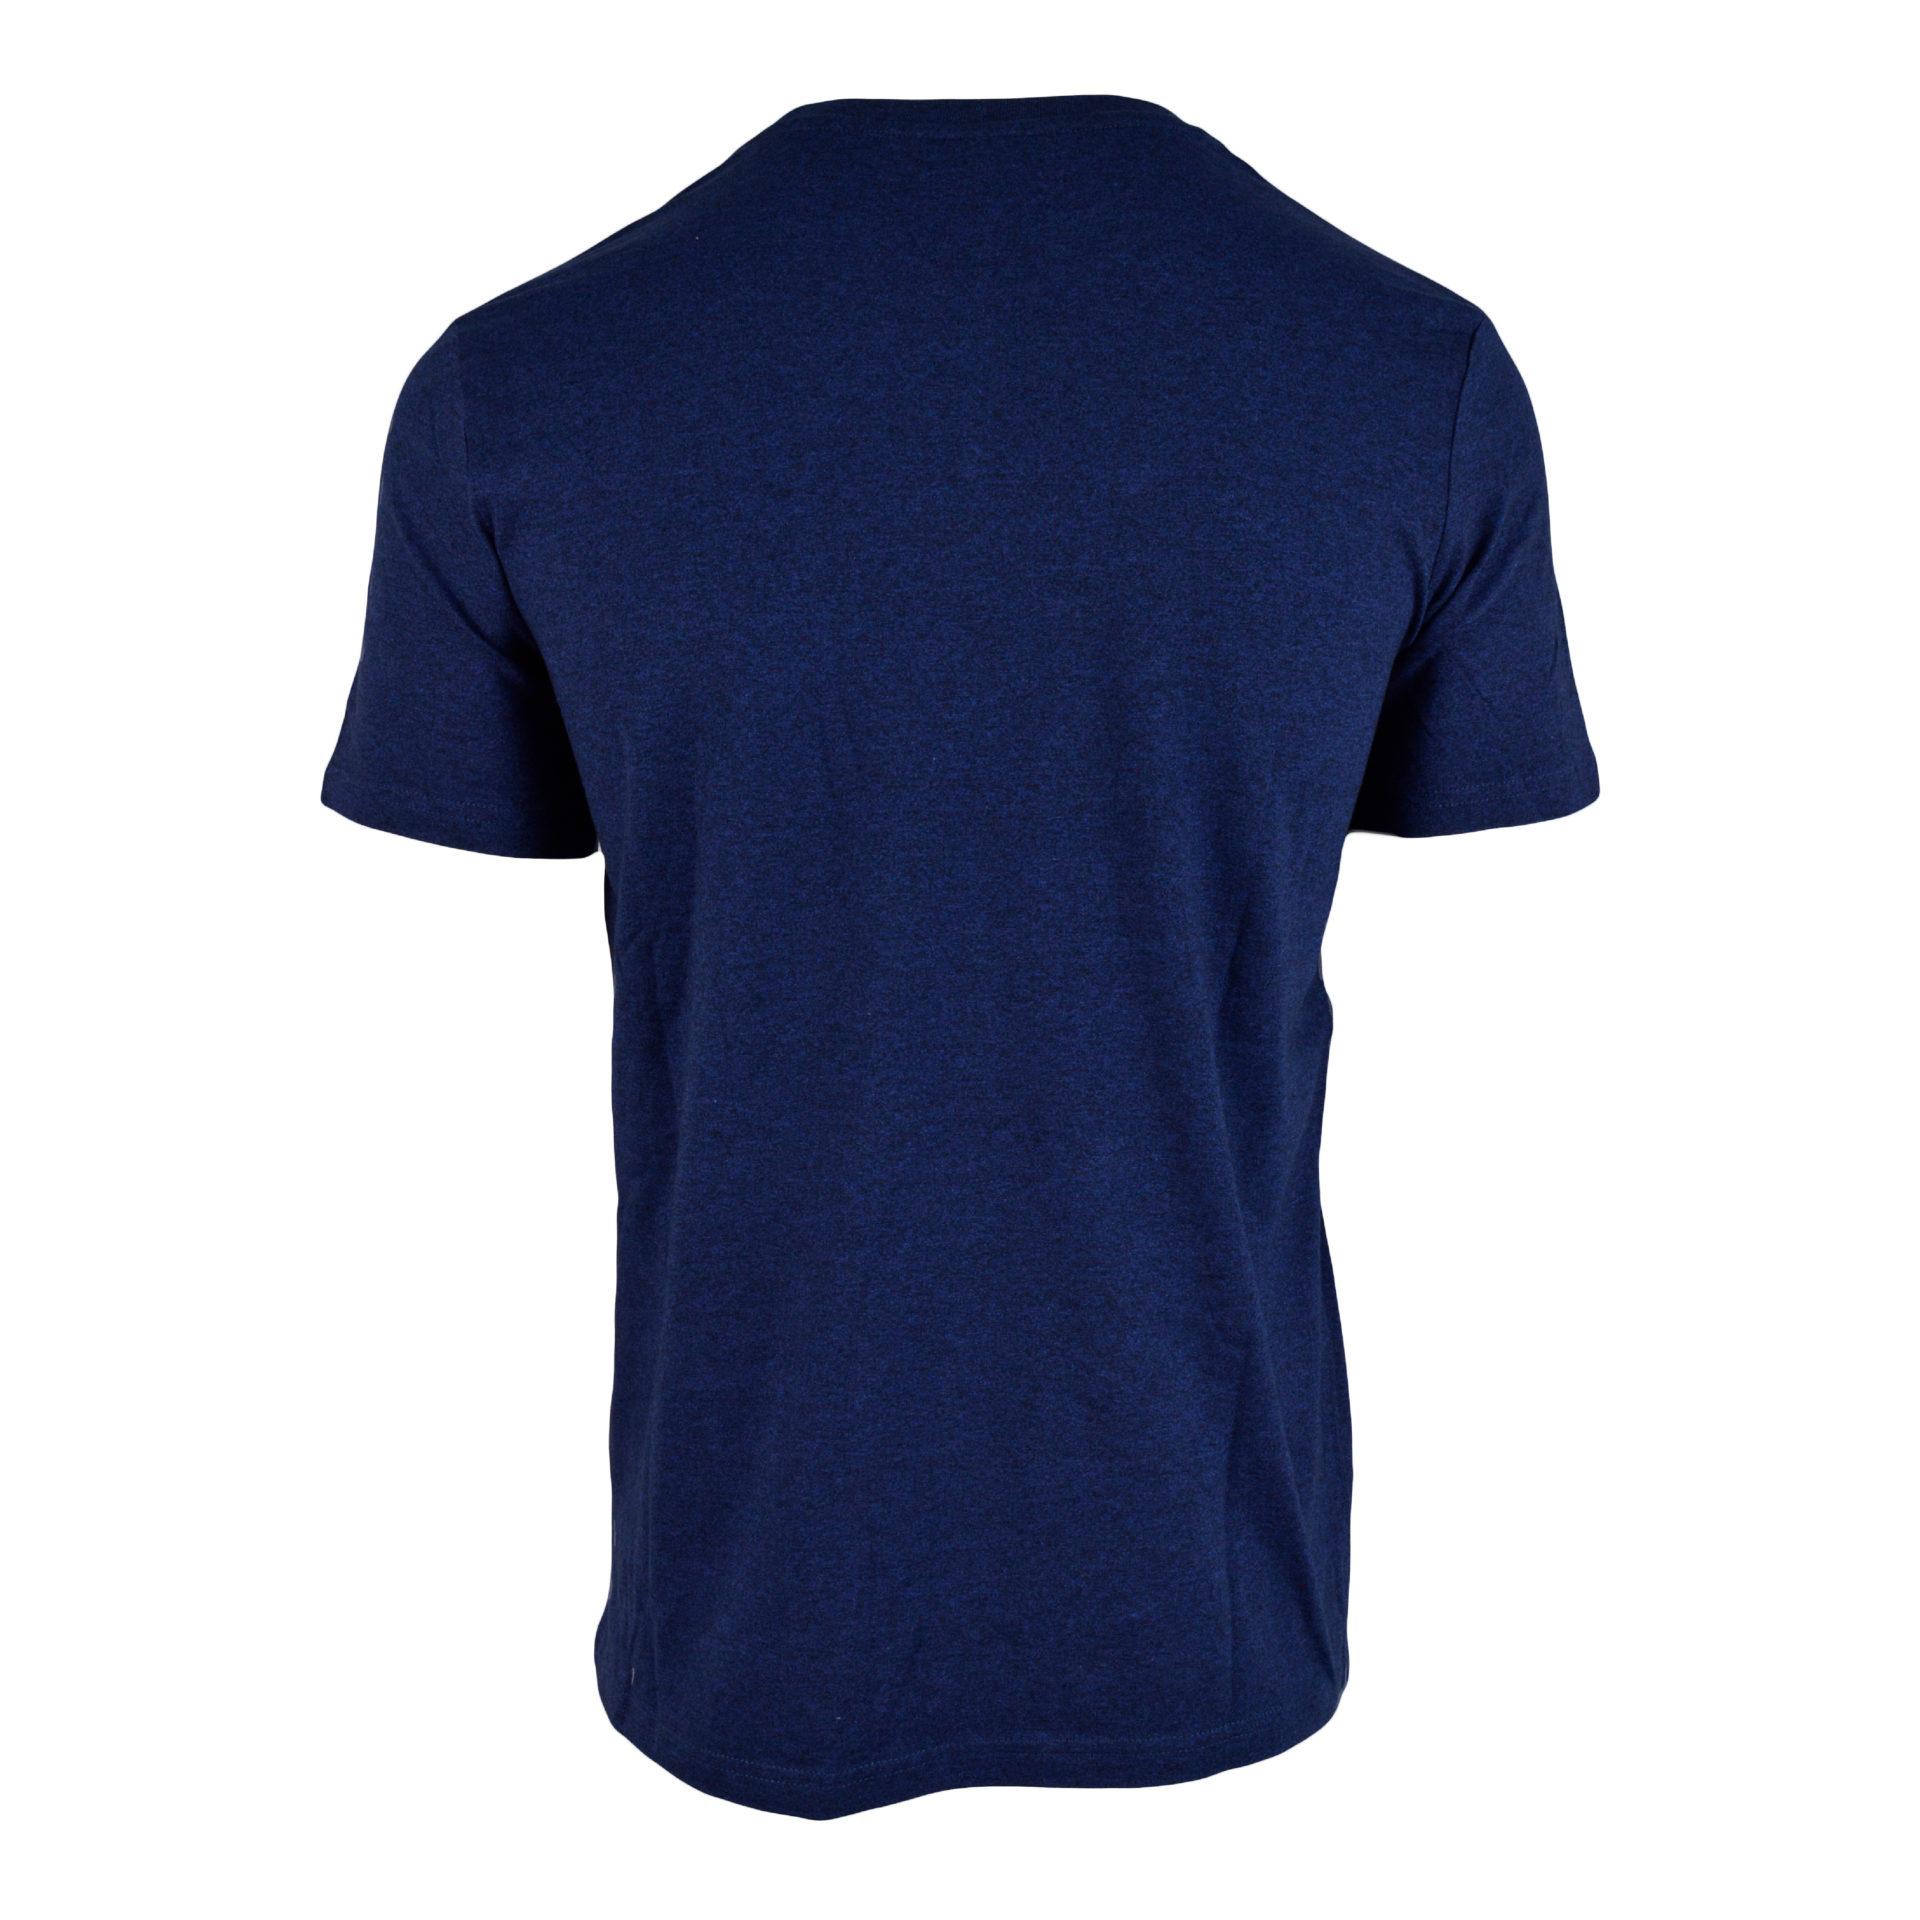 Tee shirt manches courtes VG STU755 BLEU foncé Collection Ponton